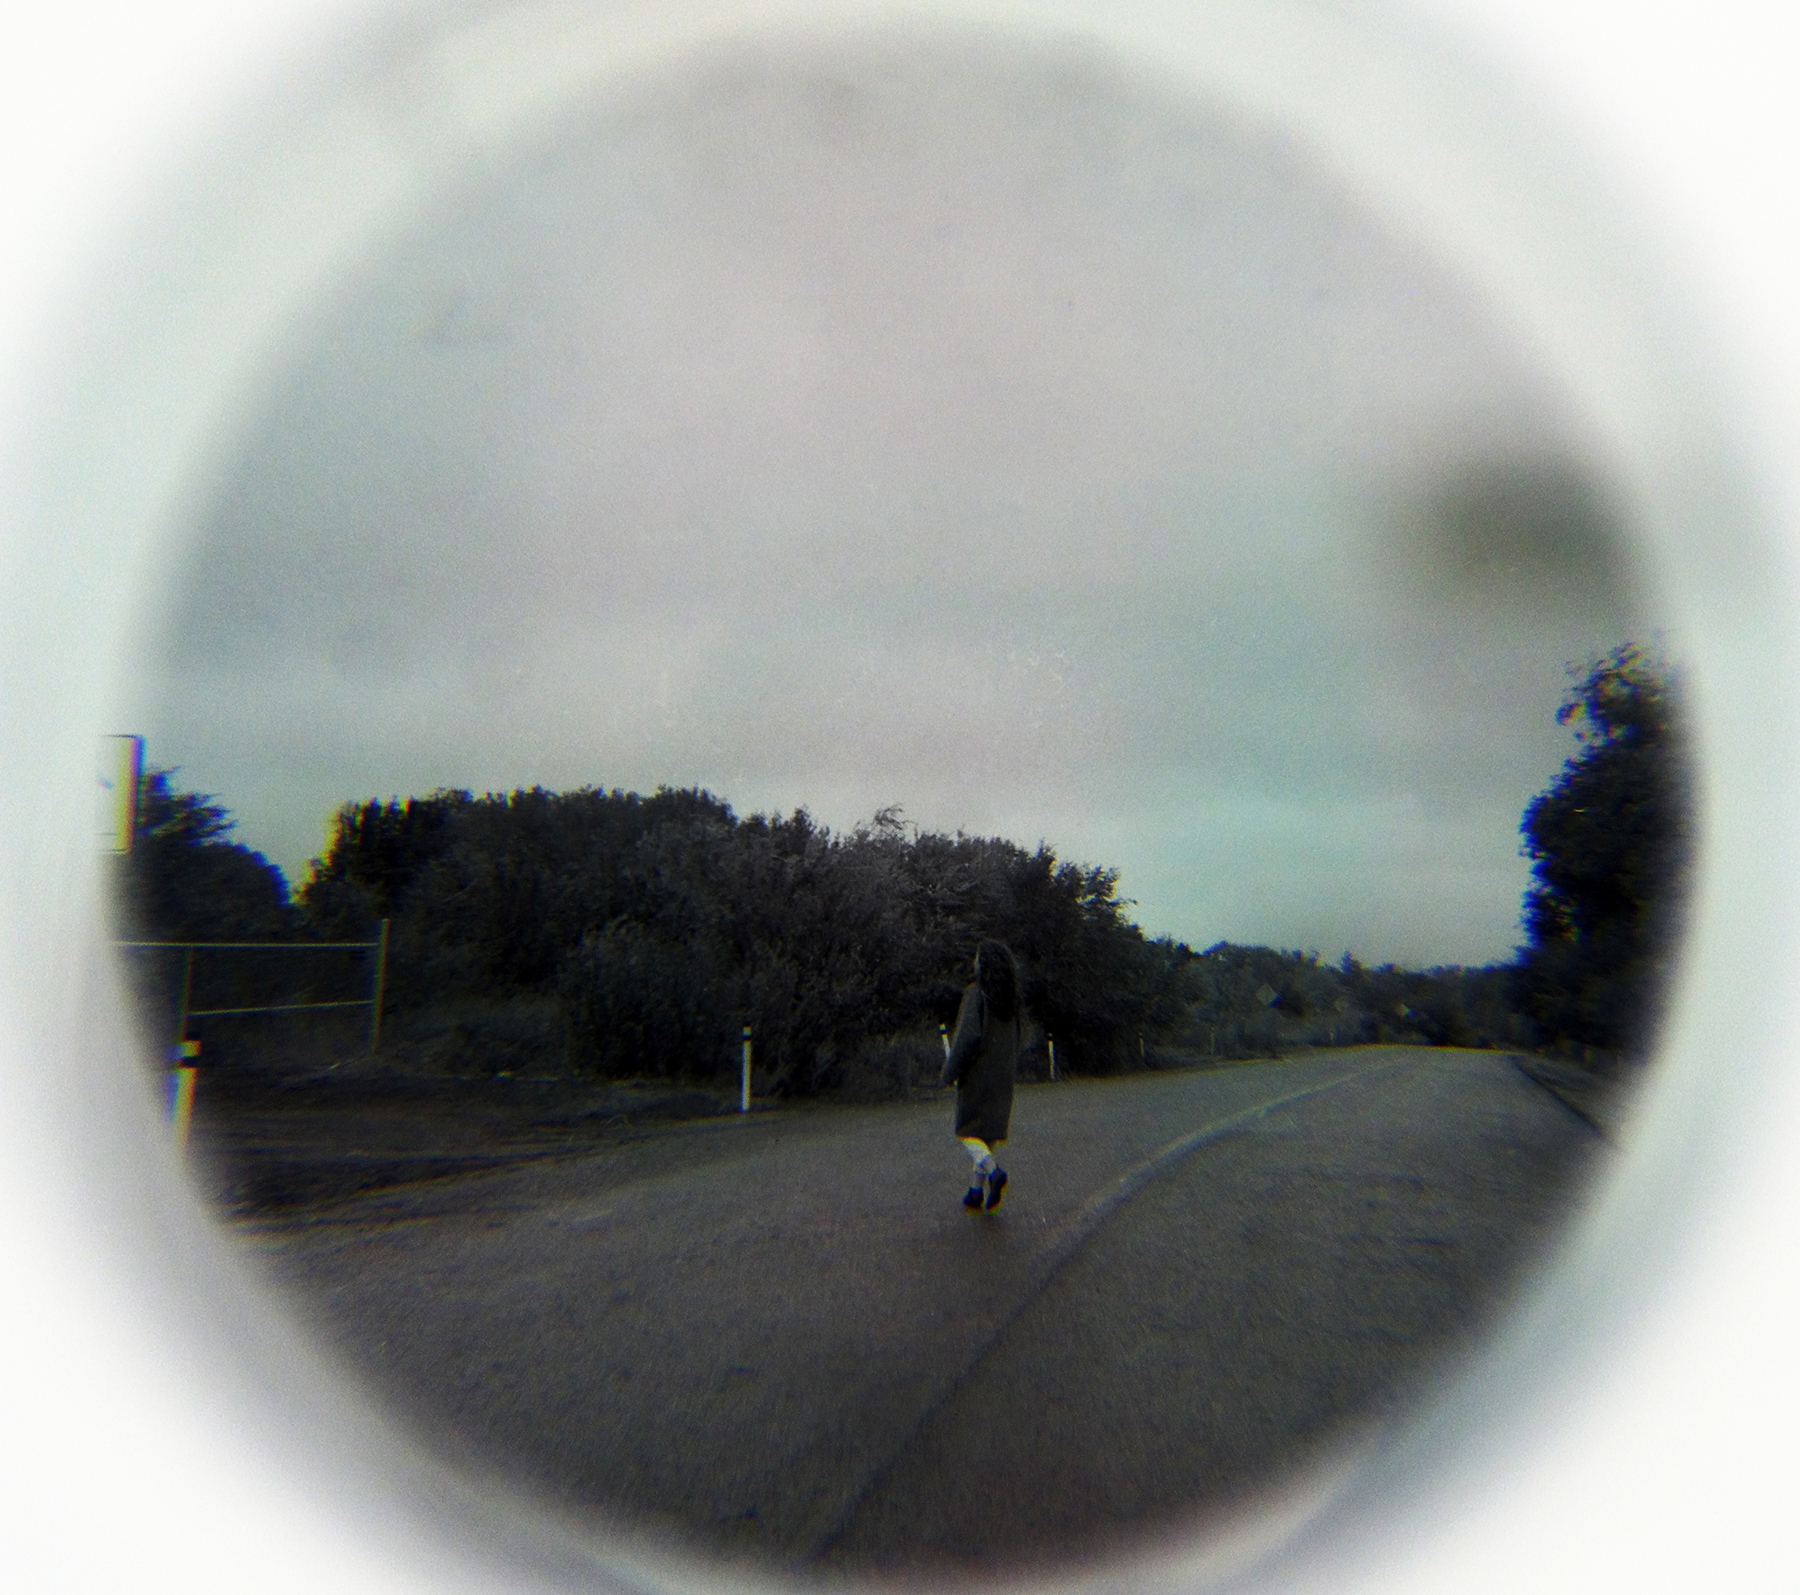 LookingGlass-notlookingback.jpeg